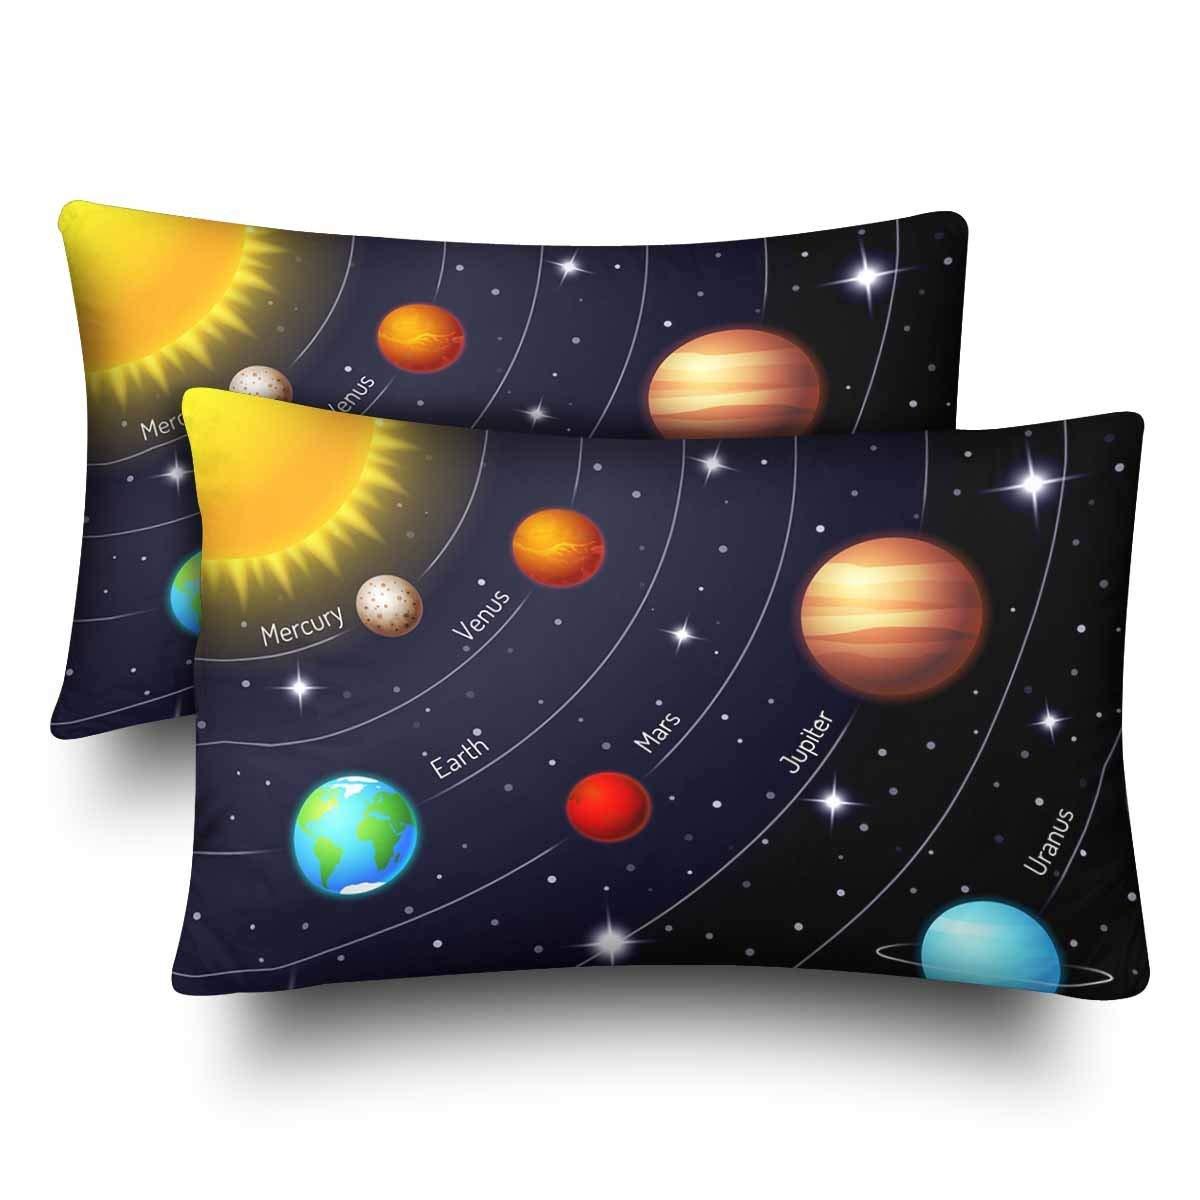 gckg solar system orbit sun earth mars twinkling night sky star pillow cases pillowcase 20x30 inches set of 2